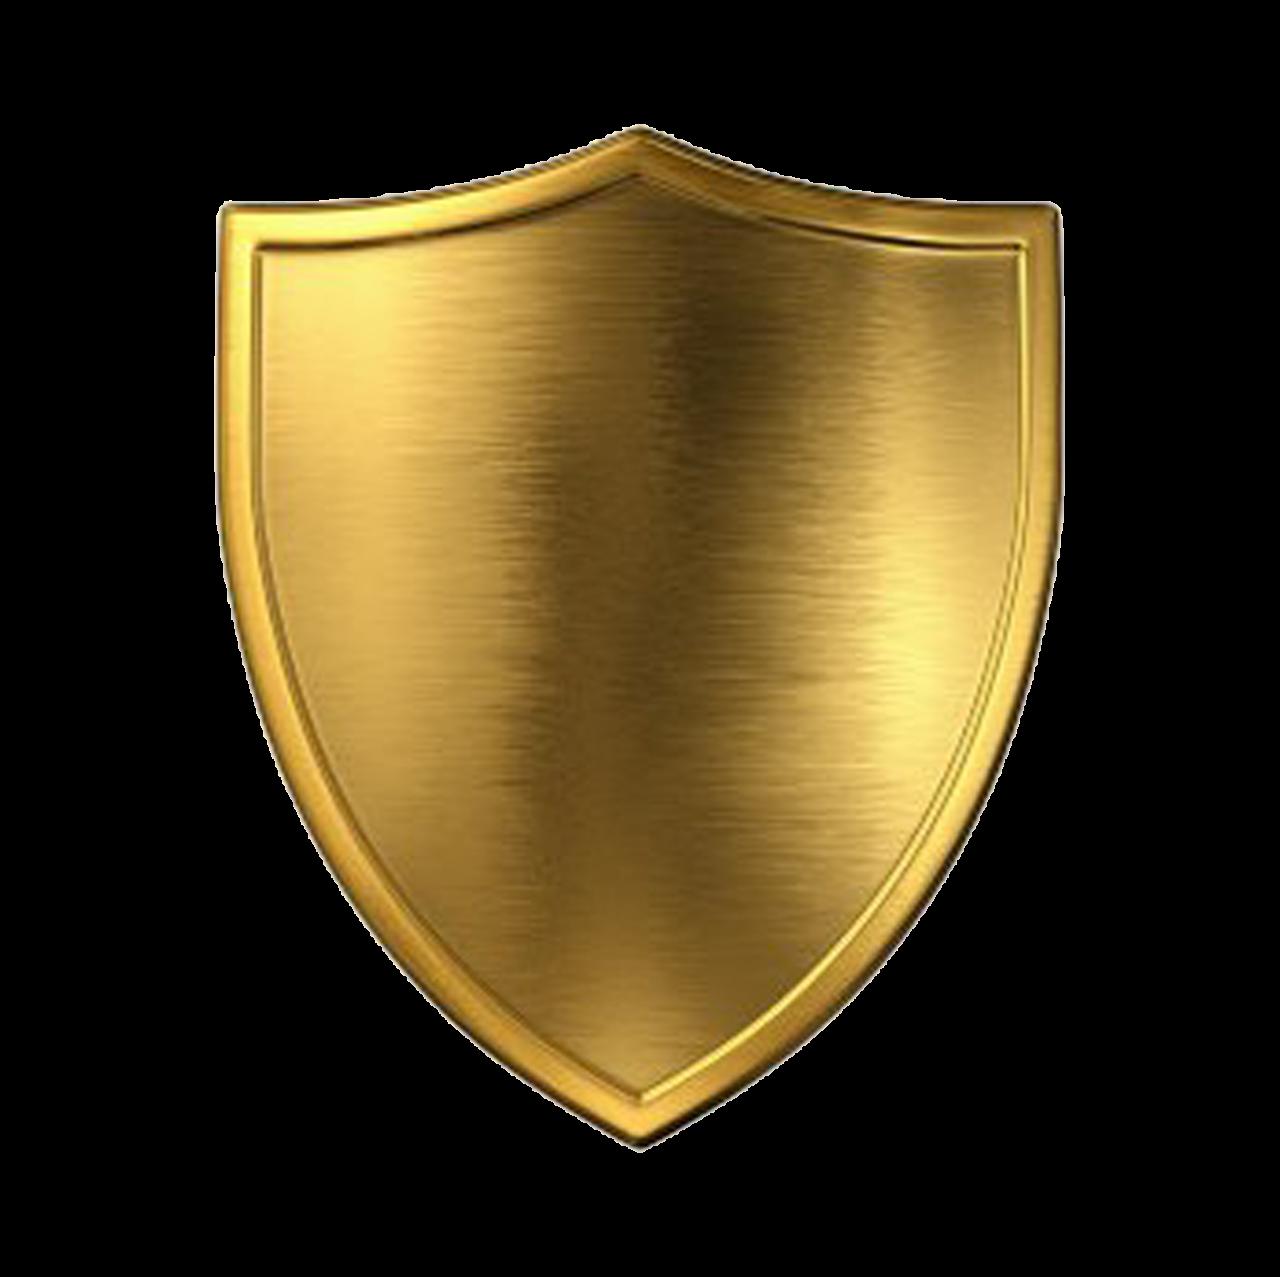 Gold  Shield PNG Image